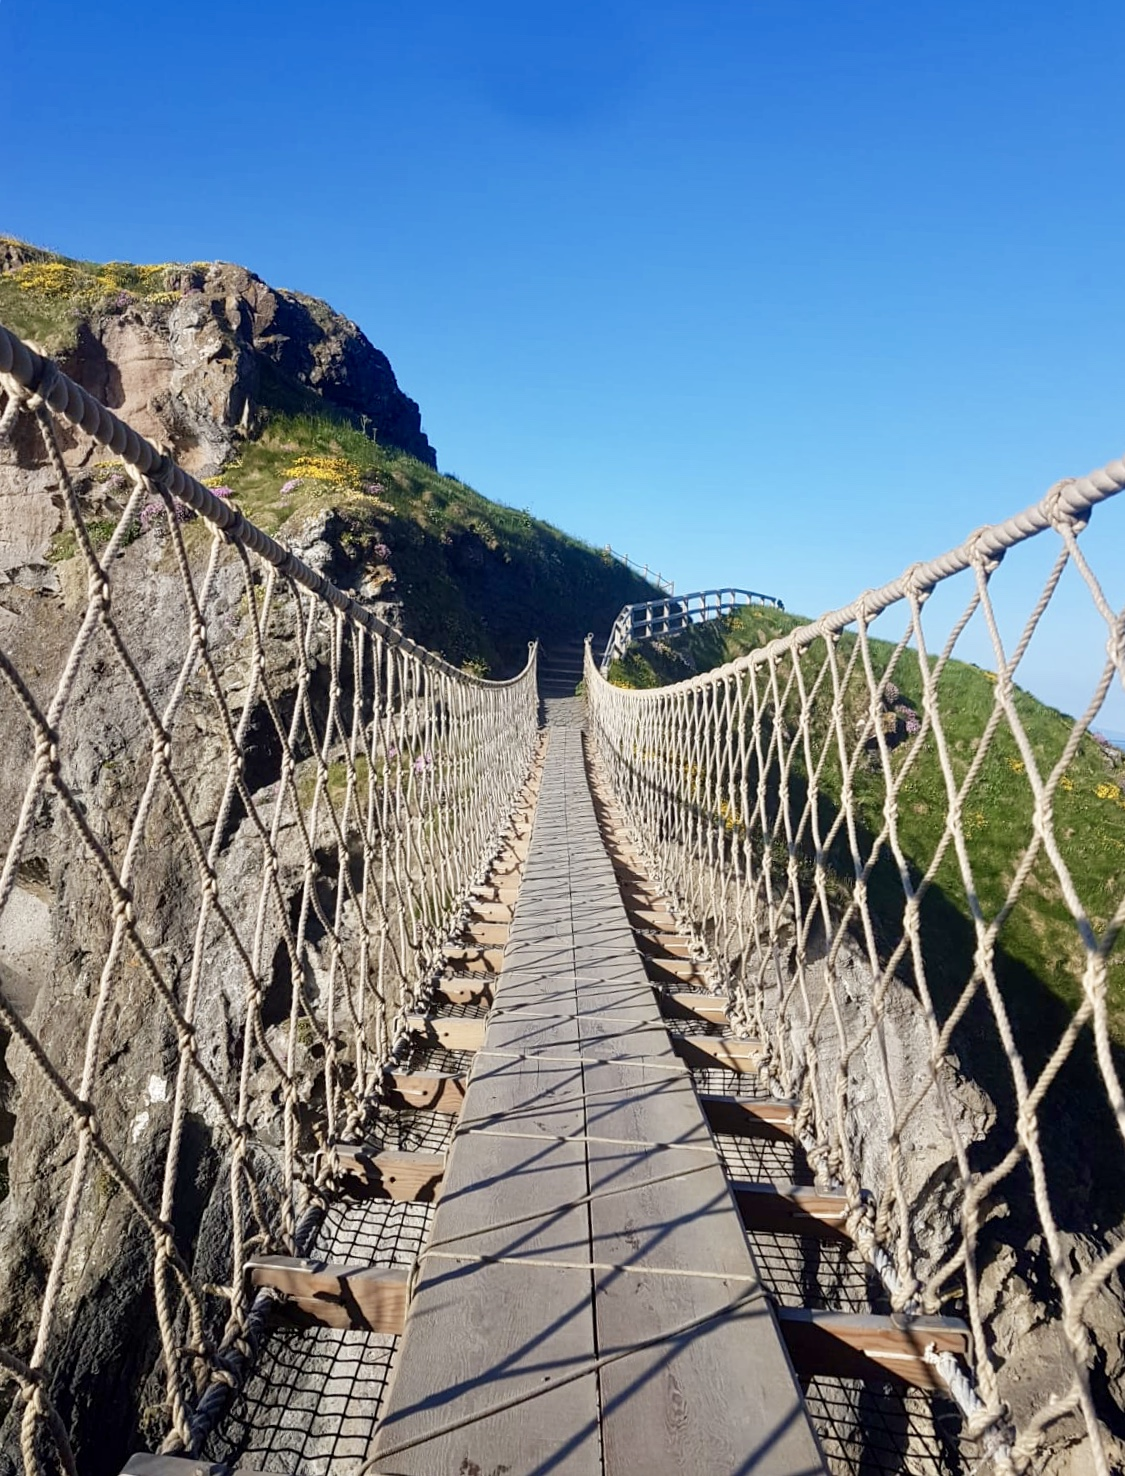 carrick-a-rede-rope-bridge-sup-paddle-board-causeway-coast (17).jpeg